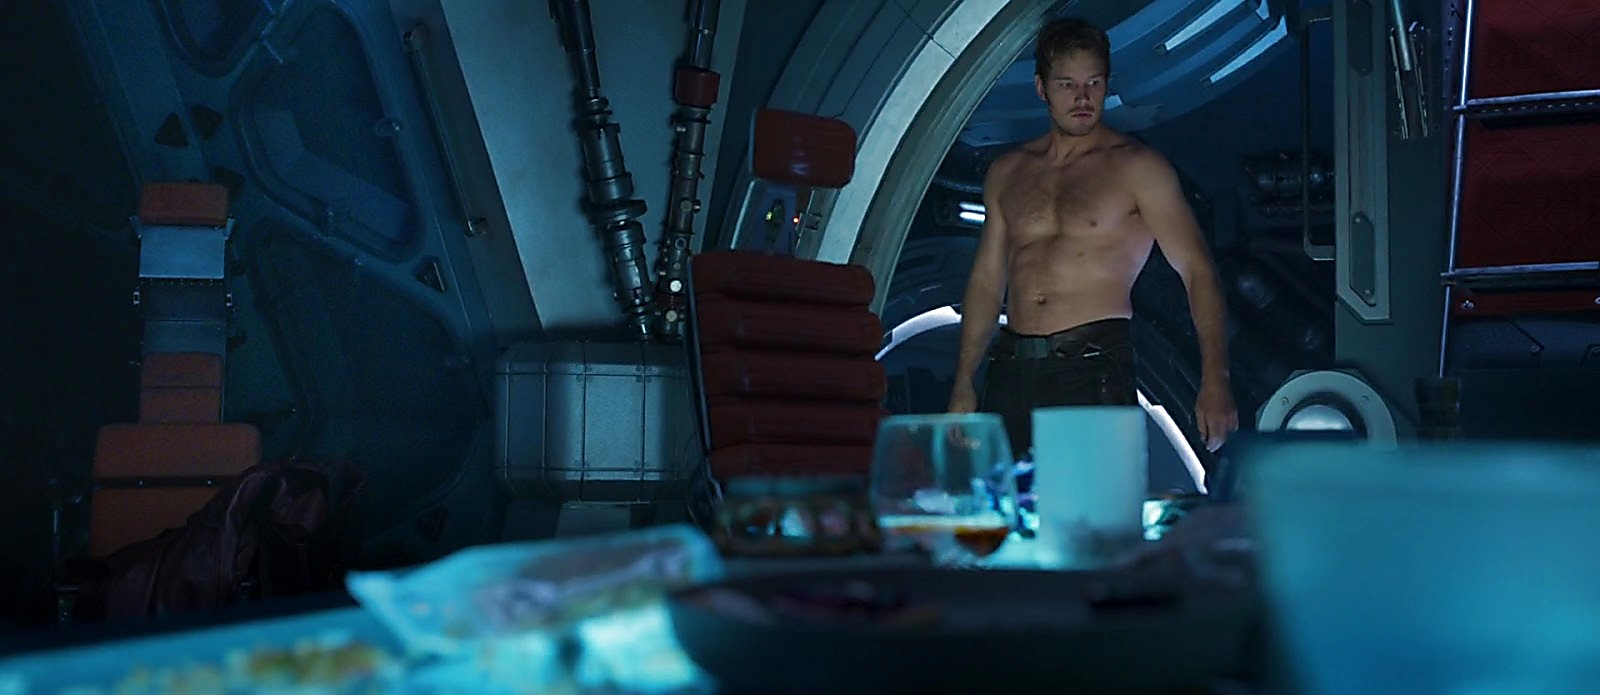 Chris Pratt sexy shirtless scene August 8, 2017, 12pm